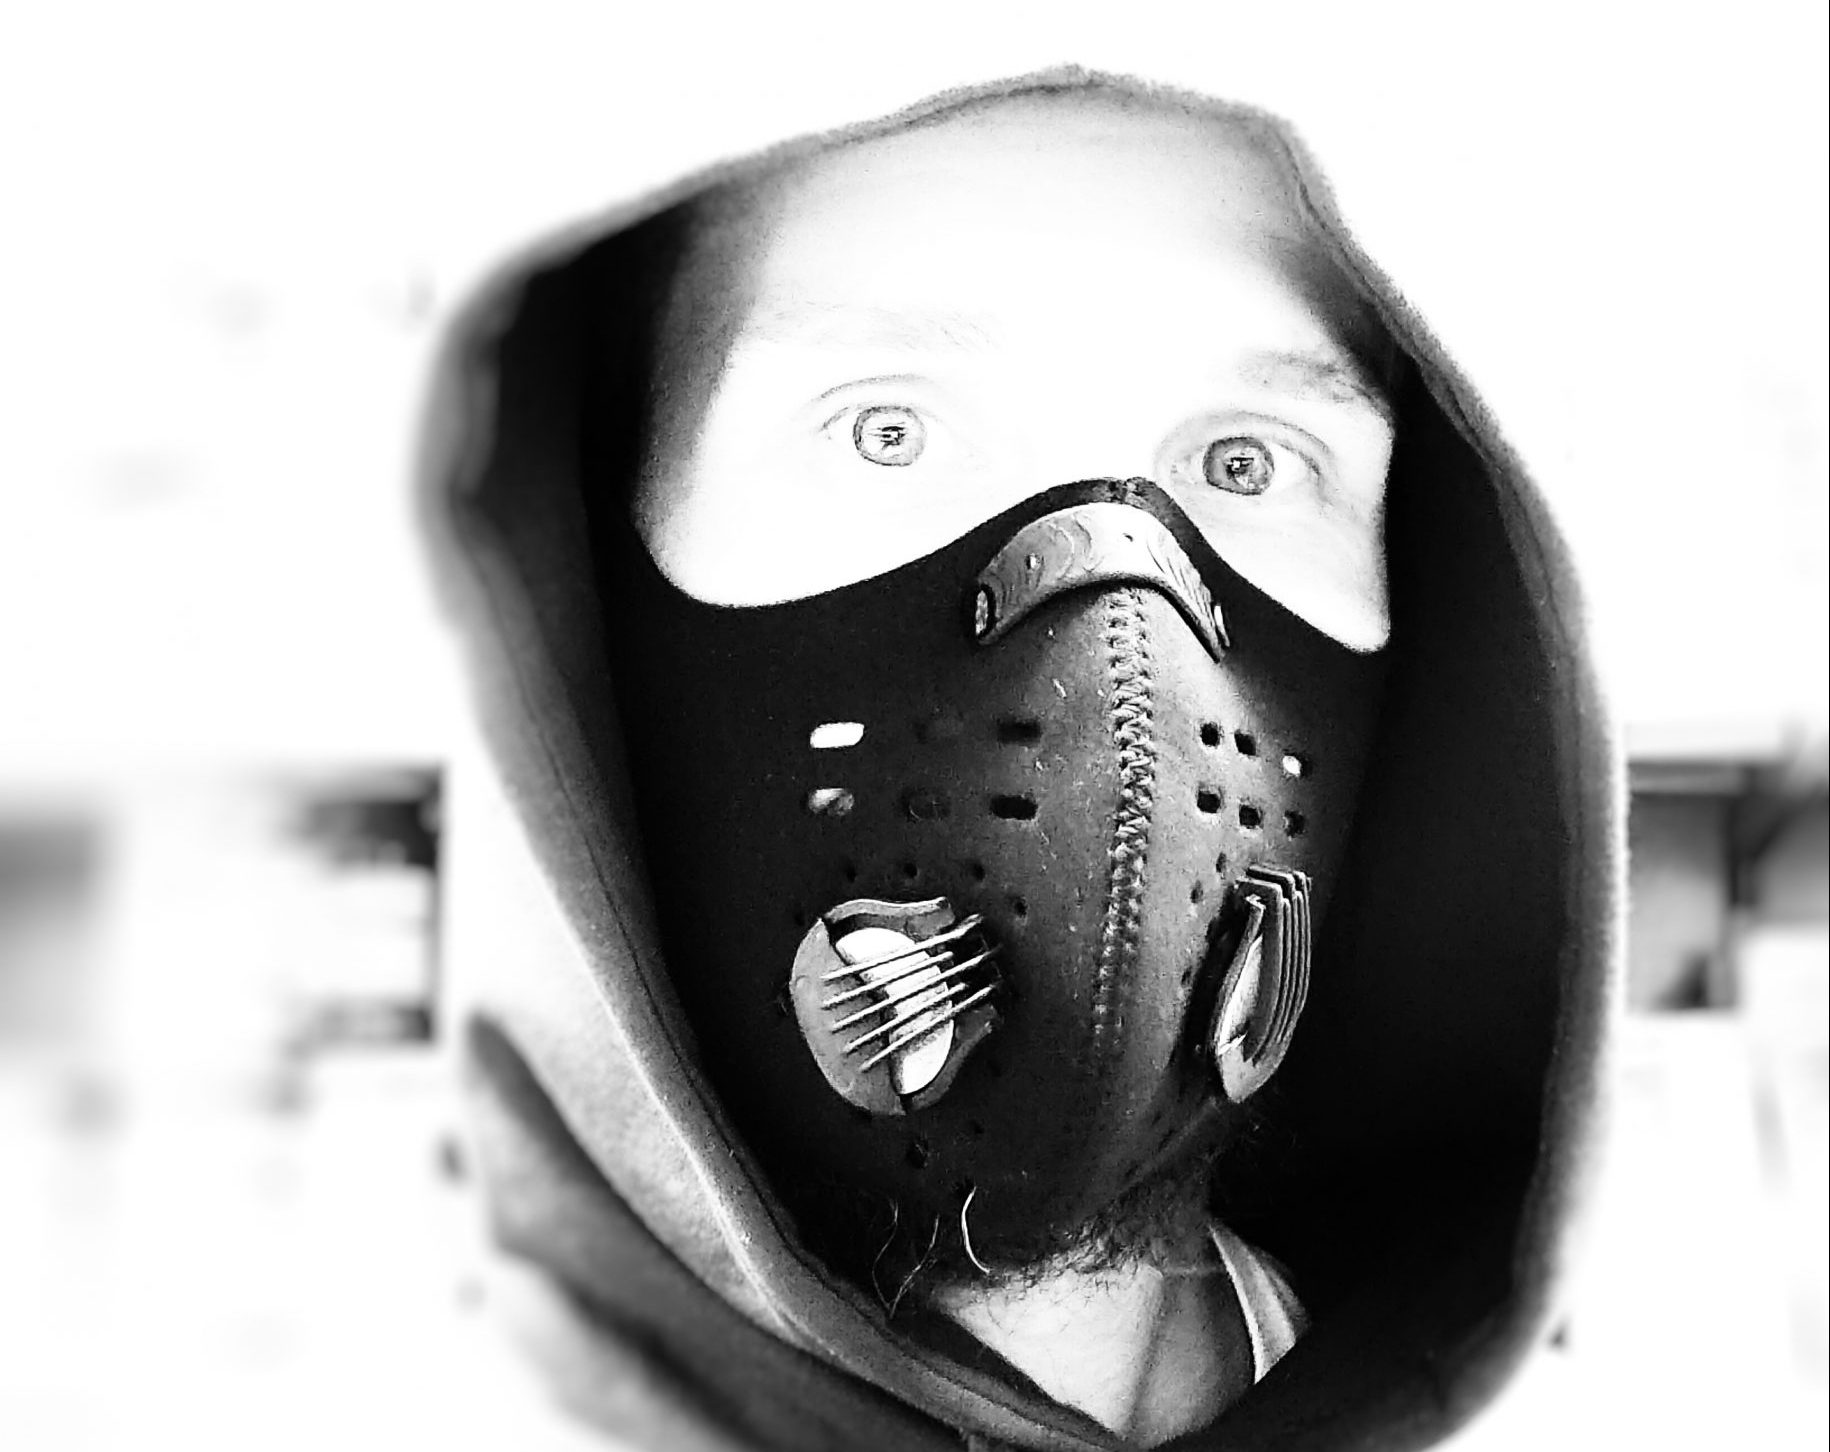 Covidiot, wear a mask!